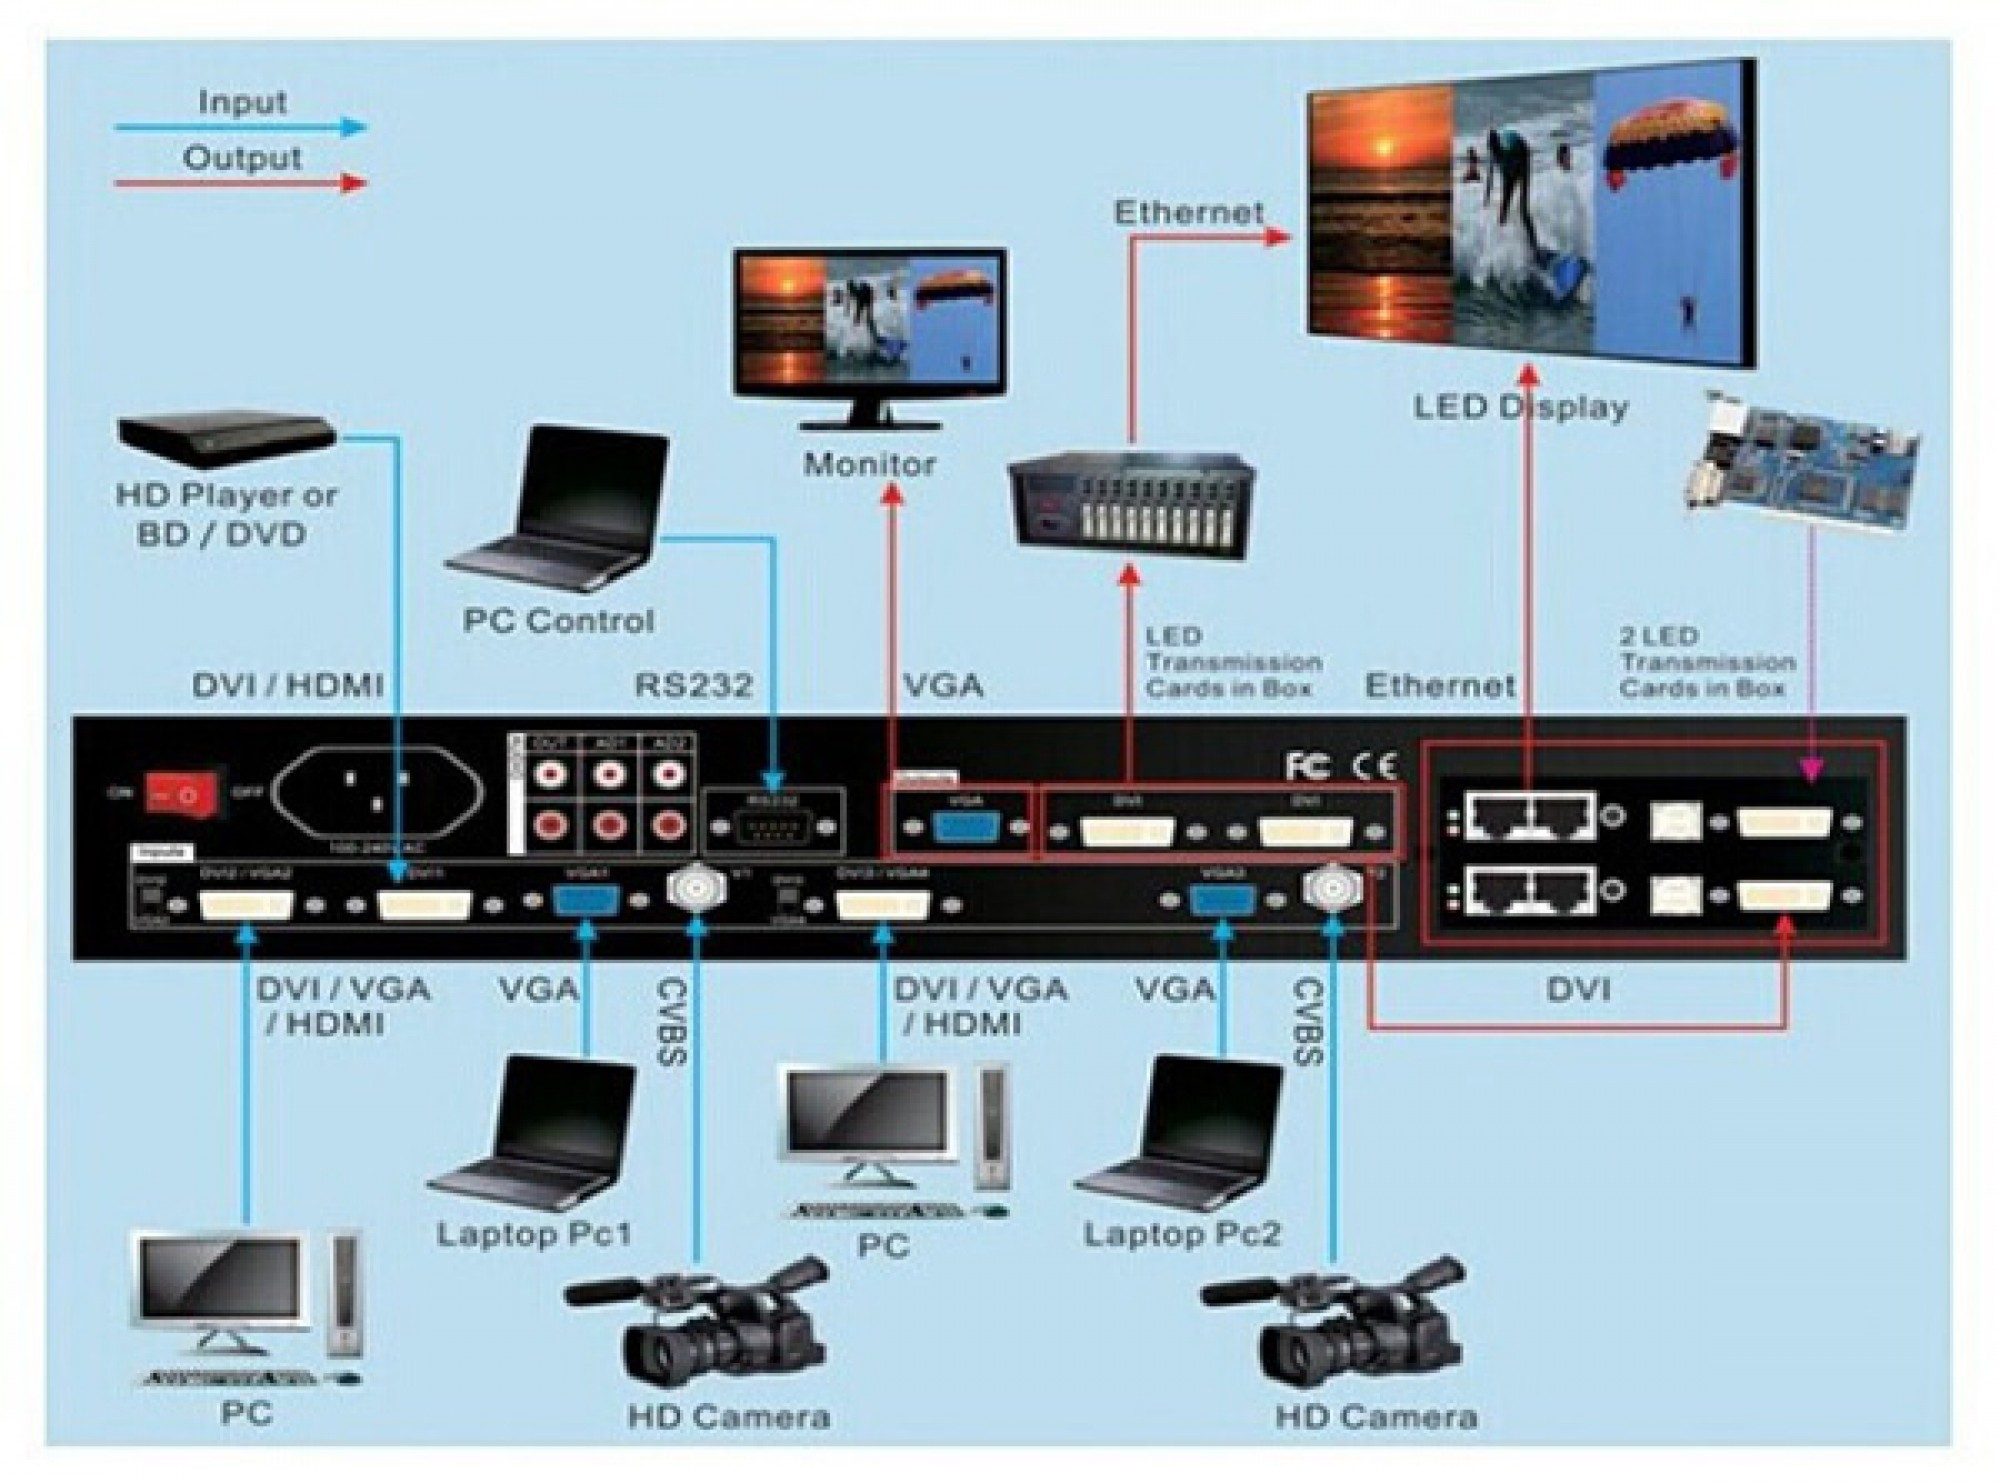 VDwall LVP606A HD LED Video Processor with 4 VGA Inputs